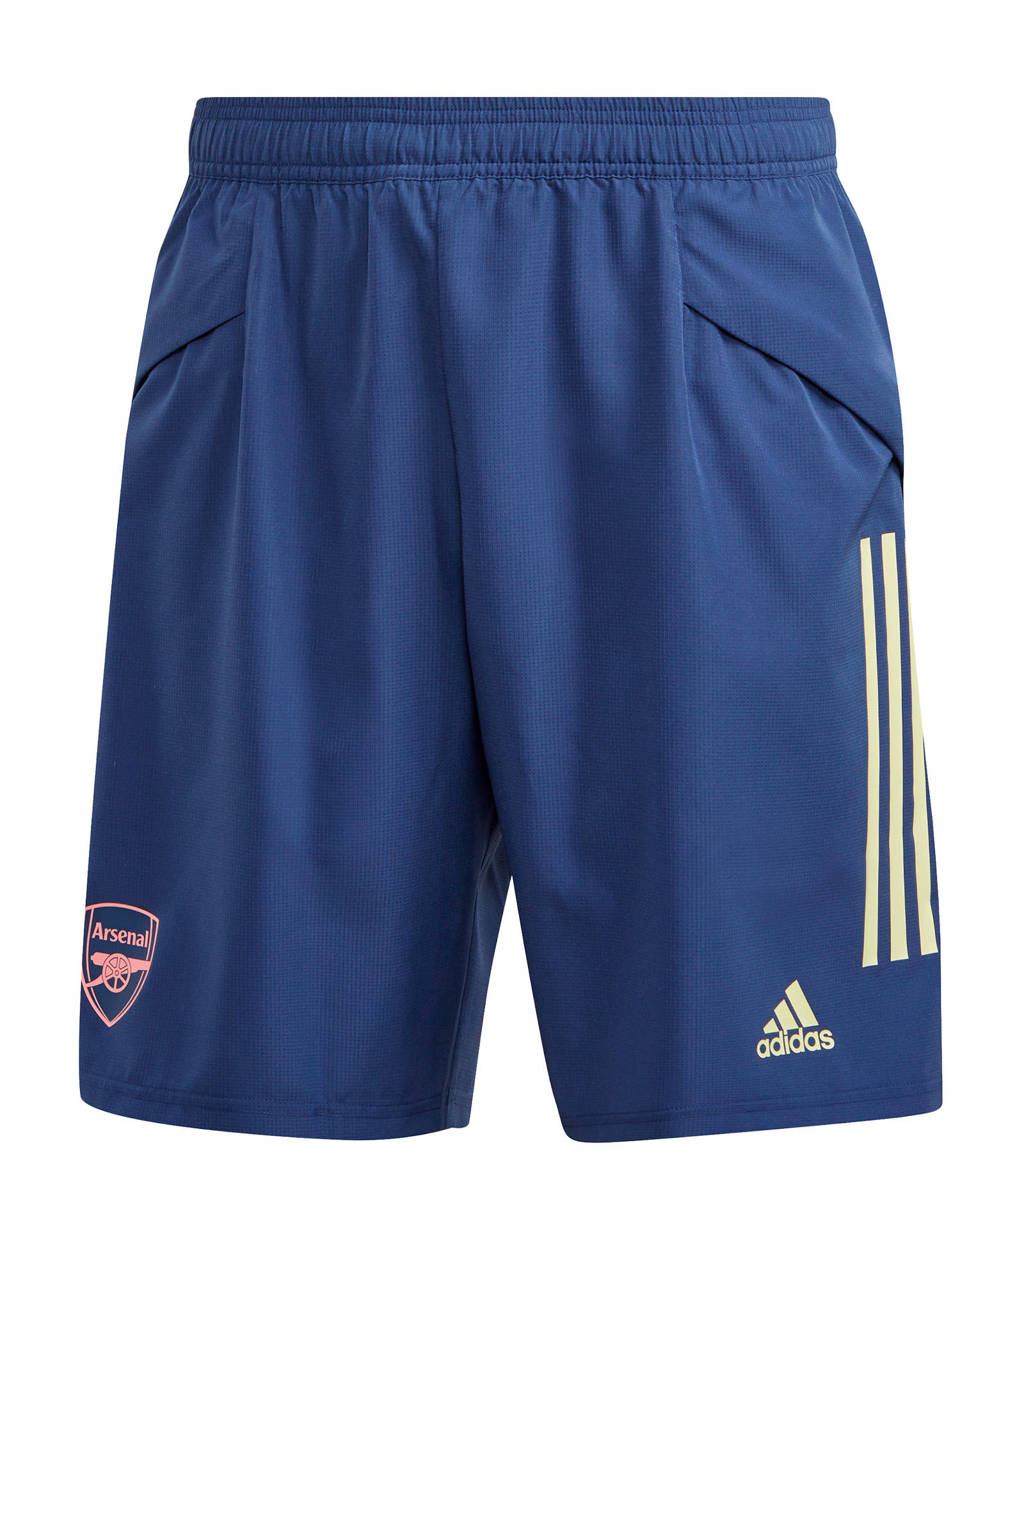 adidas Performance Senior Arsenal FC short blauw, Blauw